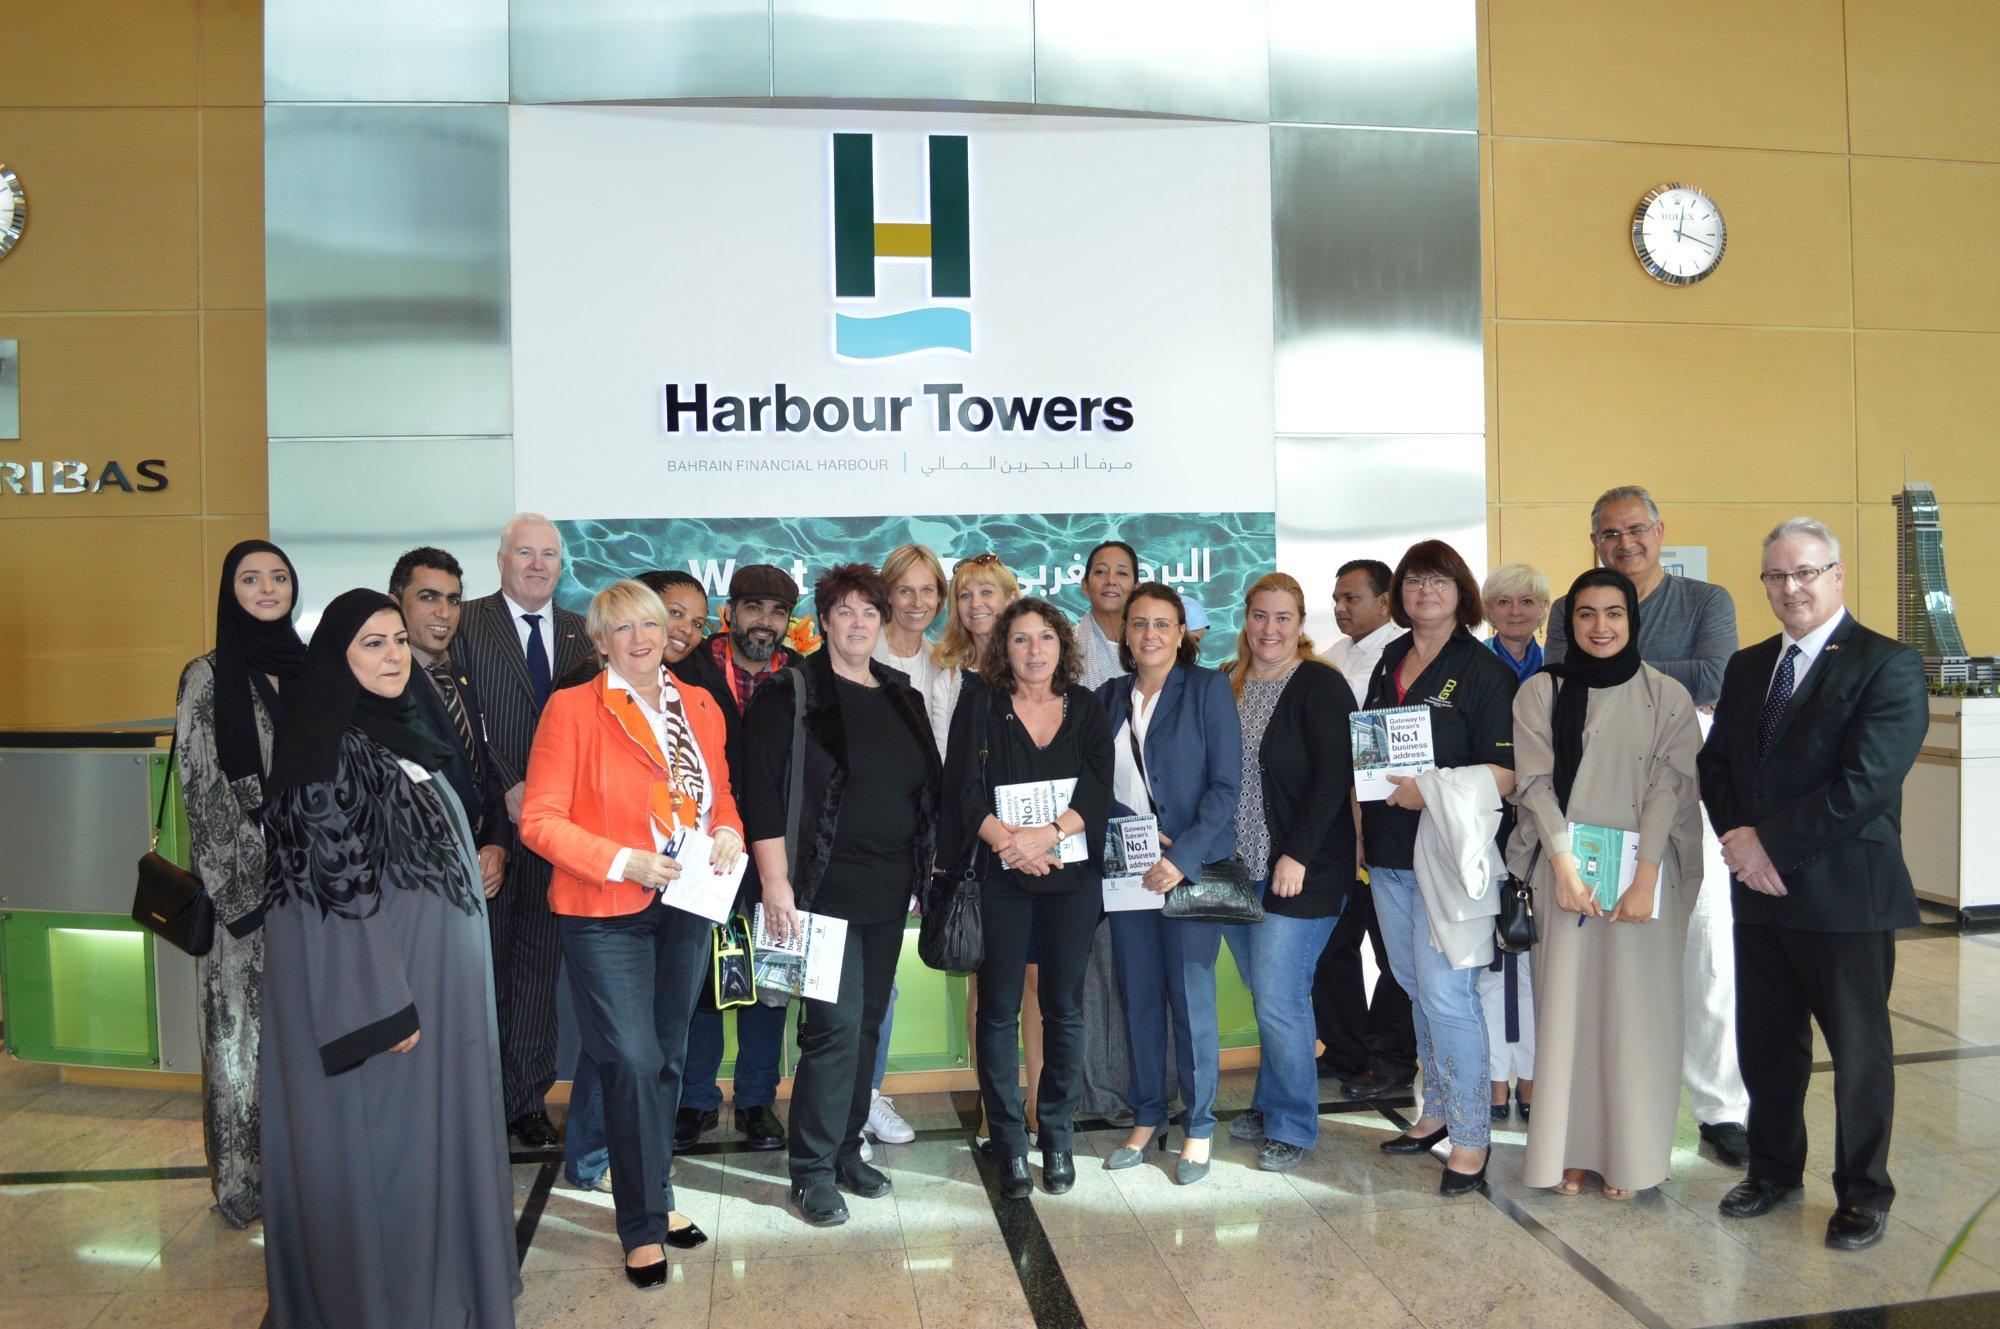 Tourism Professionals Visit The Harbour Towers